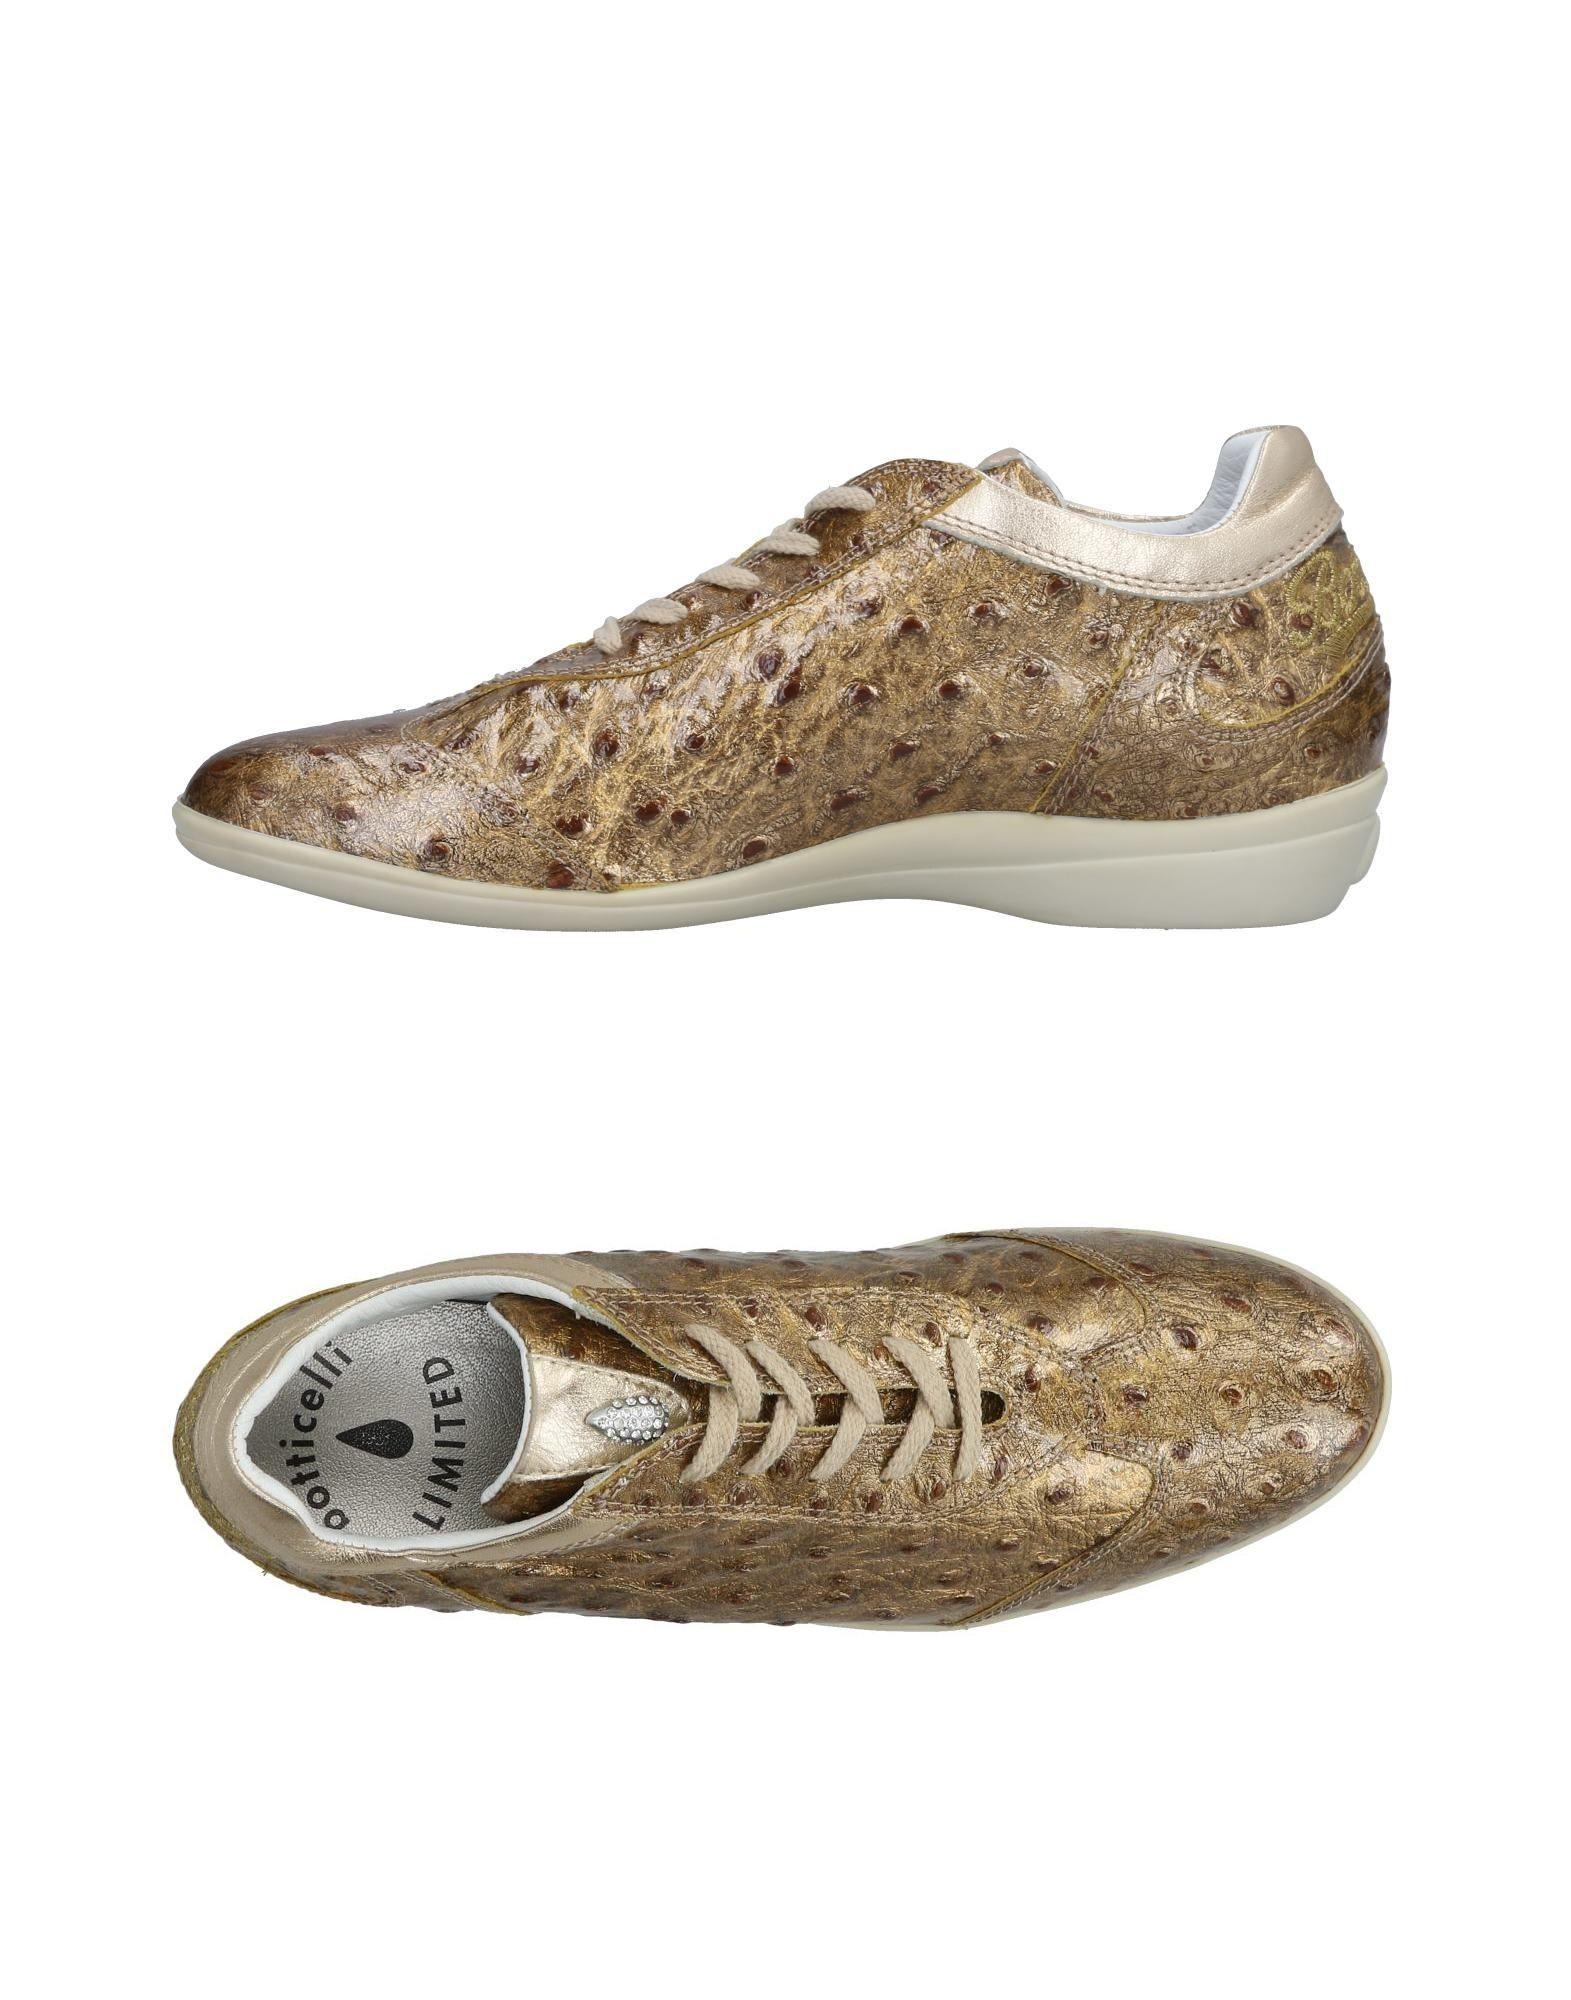 ROBERTO BOTTICELLI Низкие кеды и кроссовки roberto botticelli низкие кеды и кроссовки